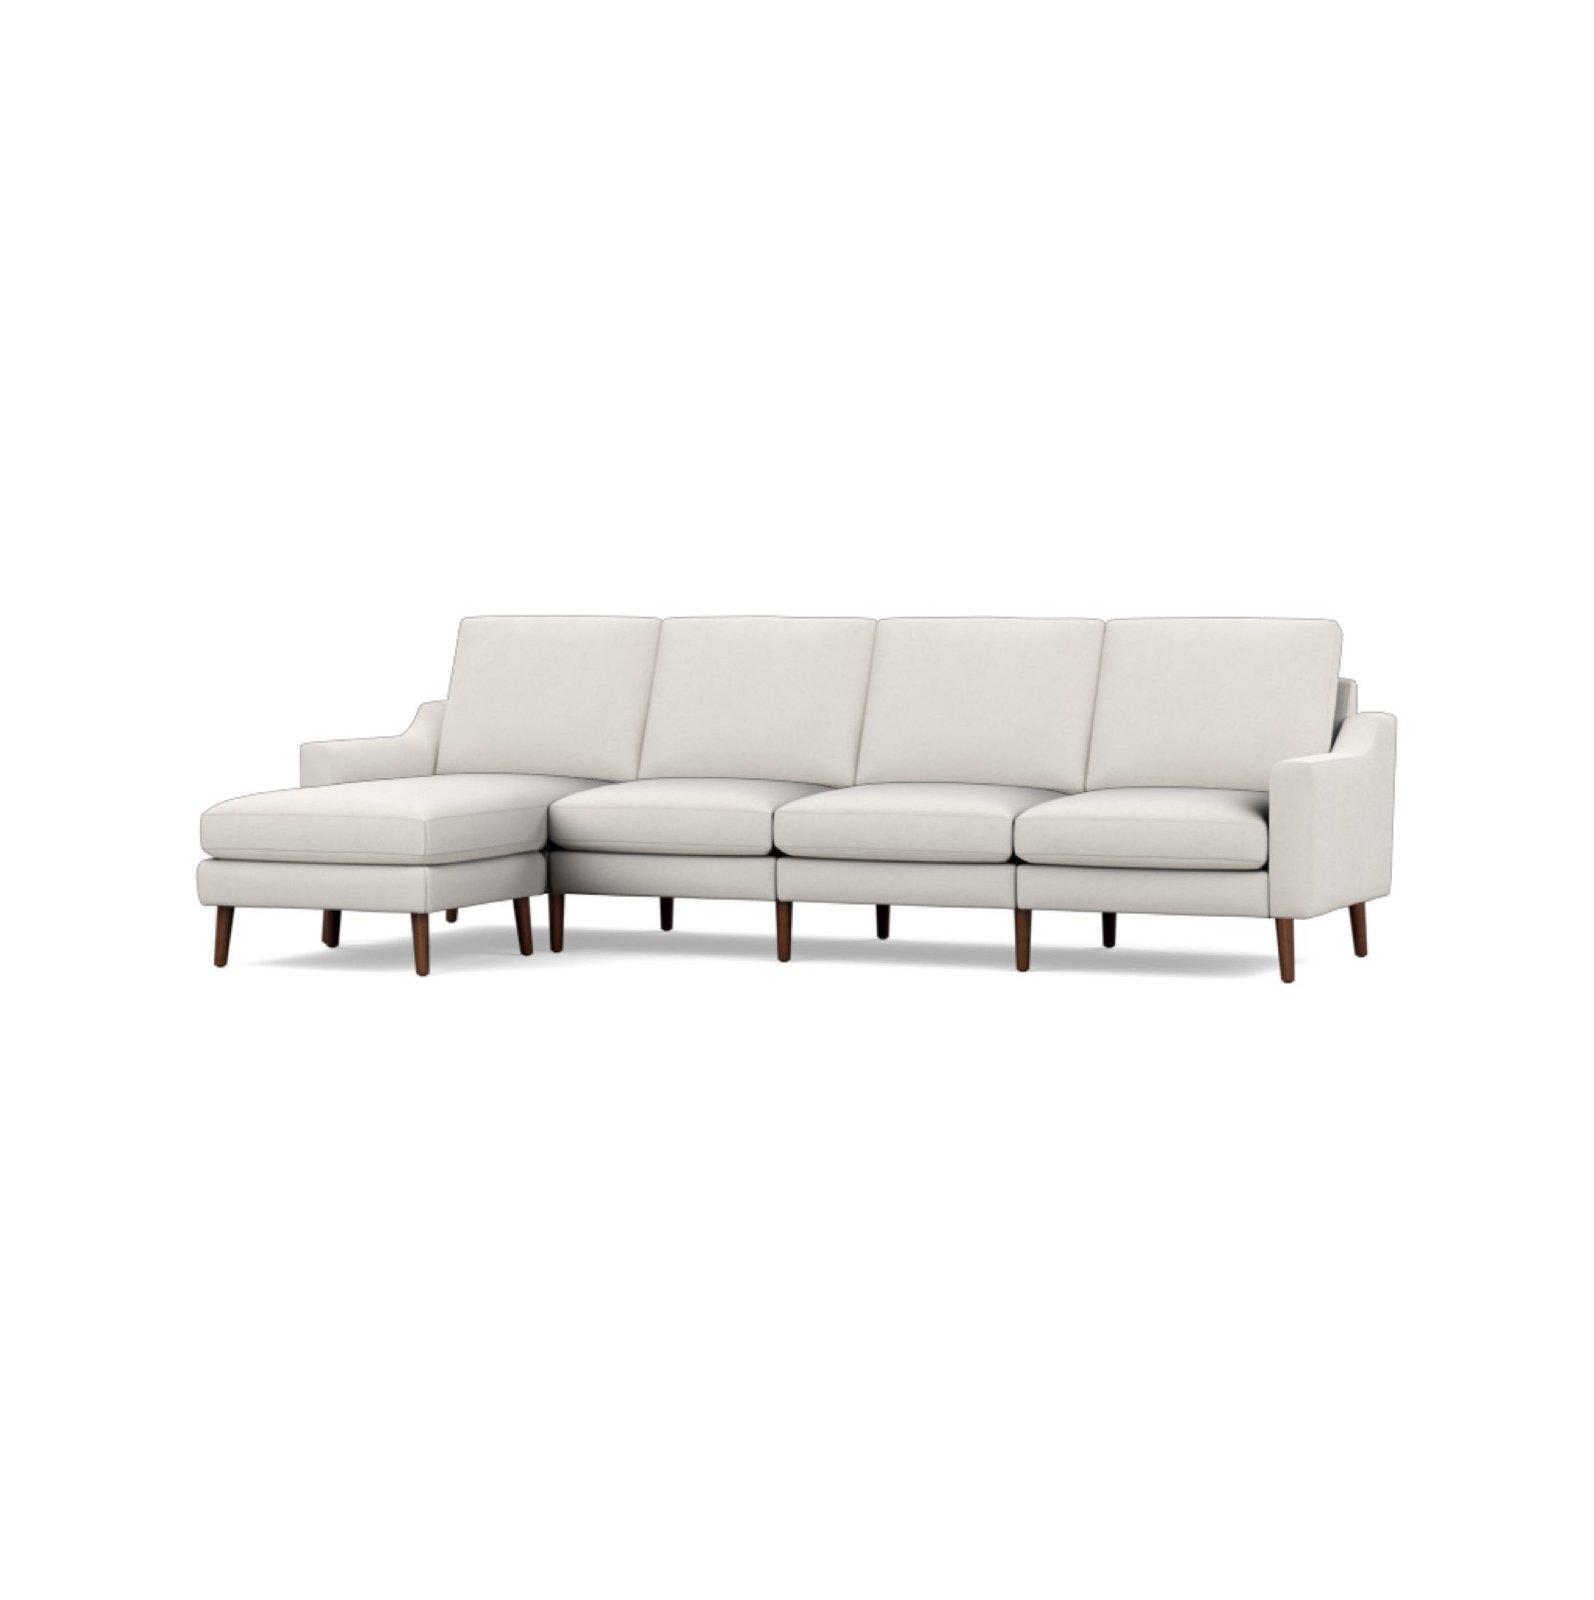 Wondrous Burrow Nomad Ivory Fabric King Sectional By Burrow Dwell Inzonedesignstudio Interior Chair Design Inzonedesignstudiocom